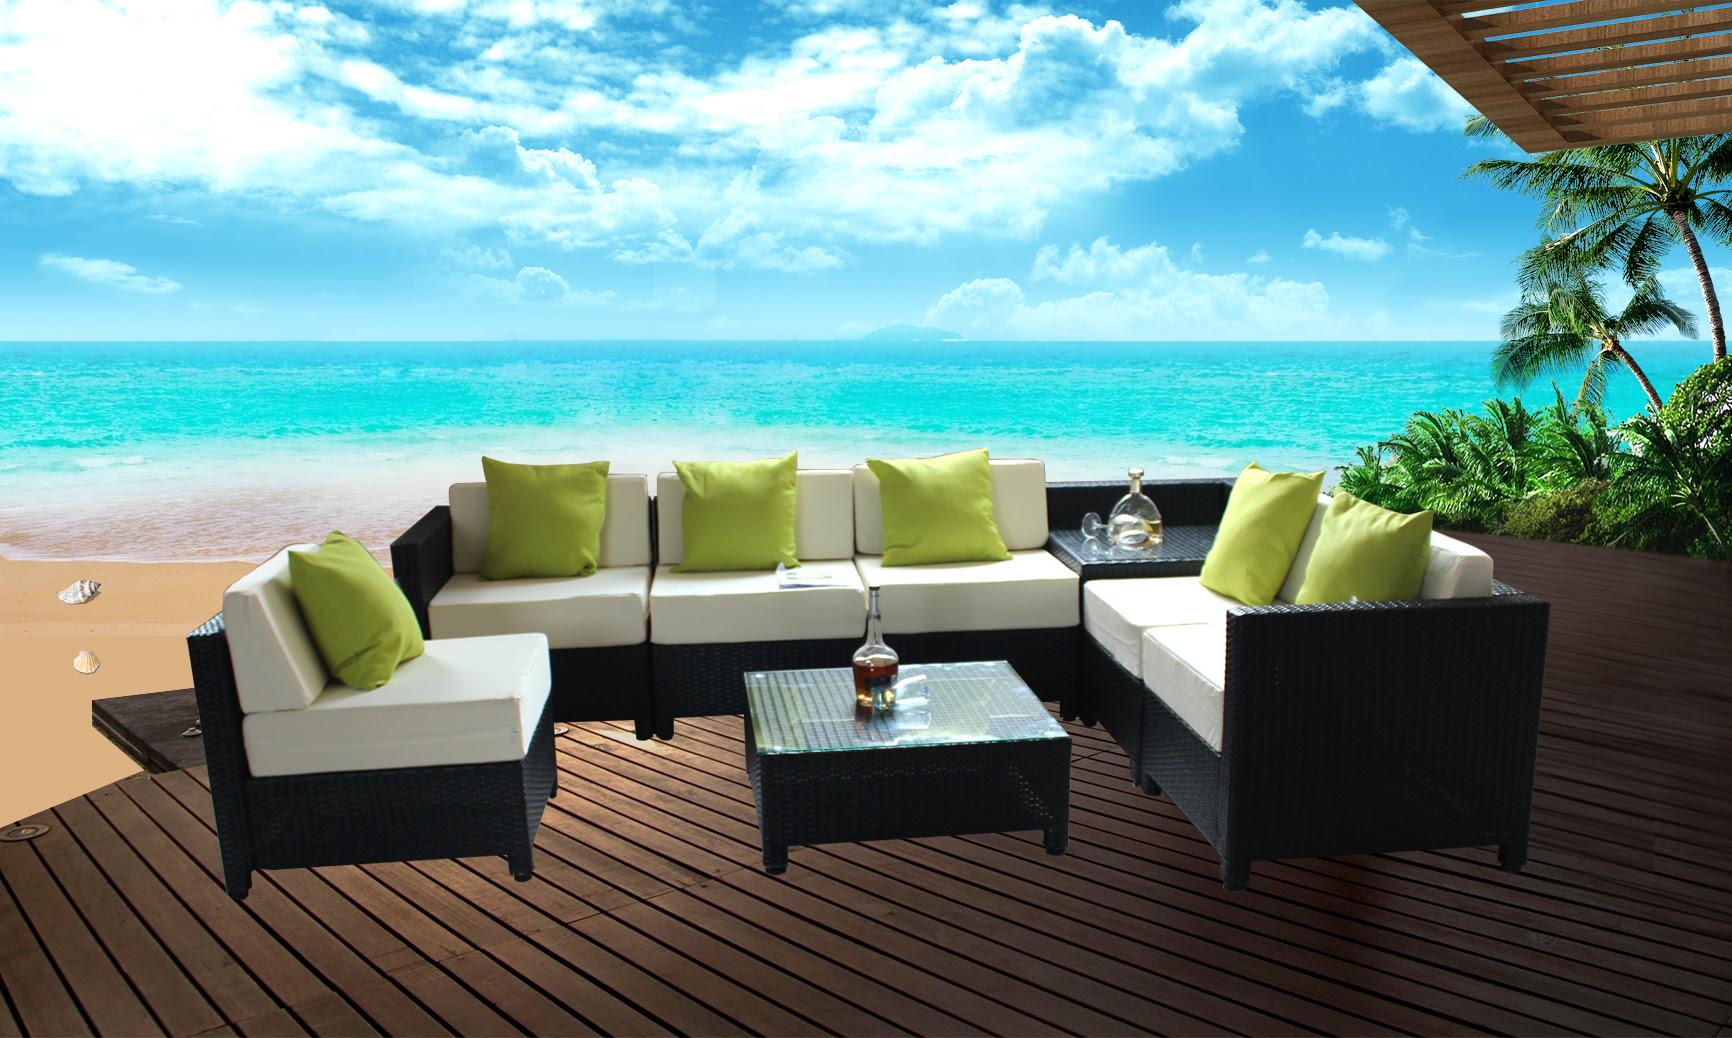 MCombo 8pc Black Wicker Patio Sectional Outdoor Sofa ...